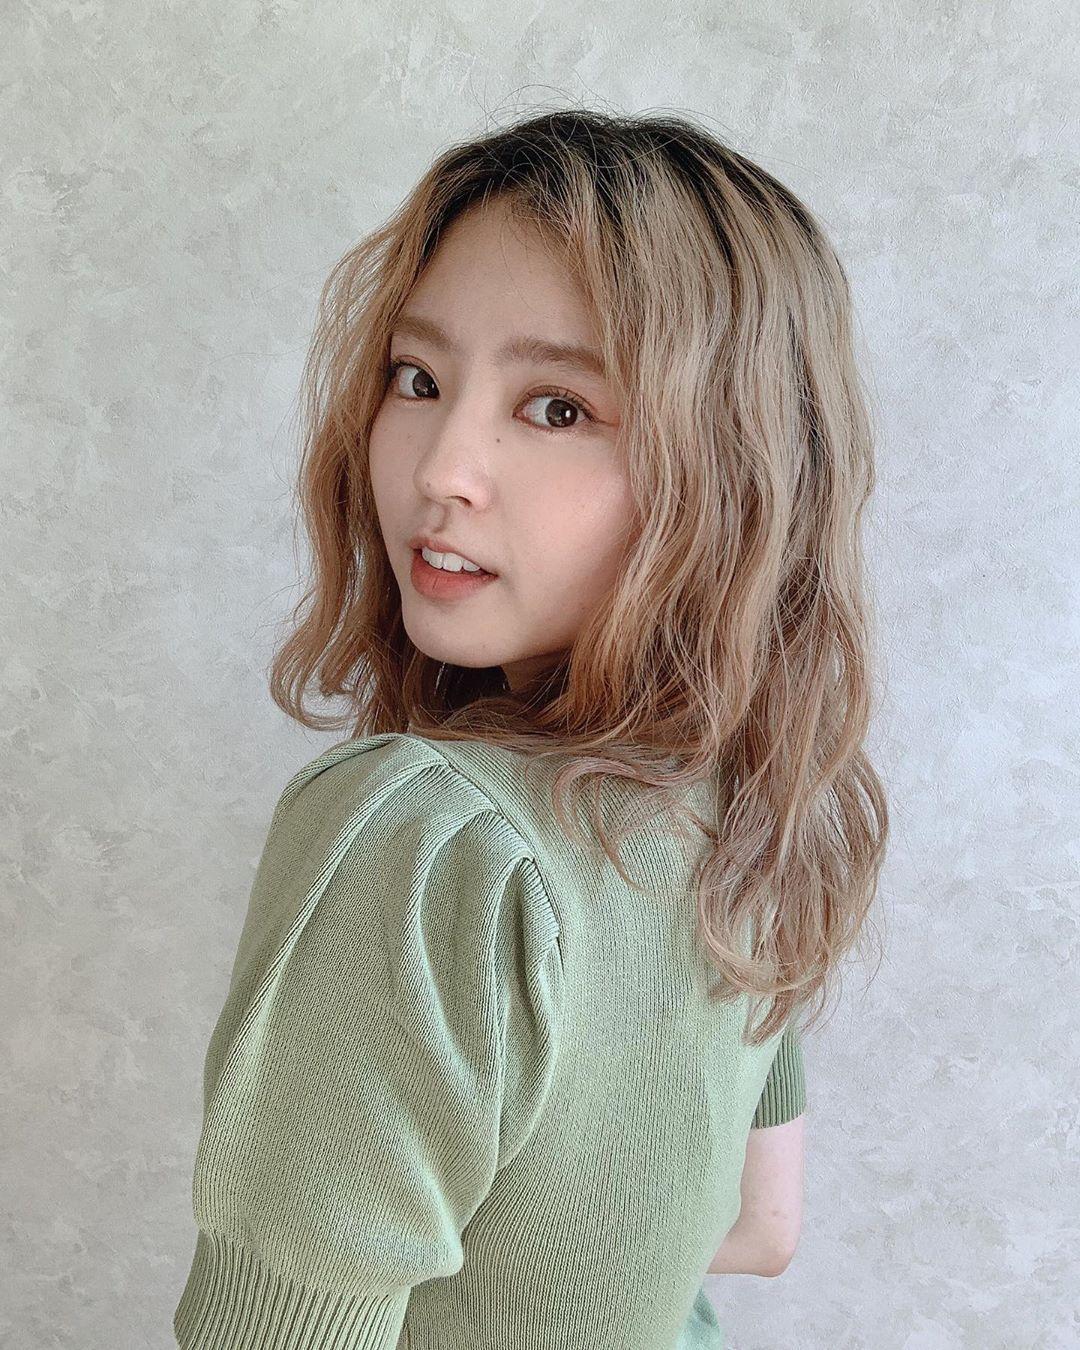 美 instagram 鈴本 愉